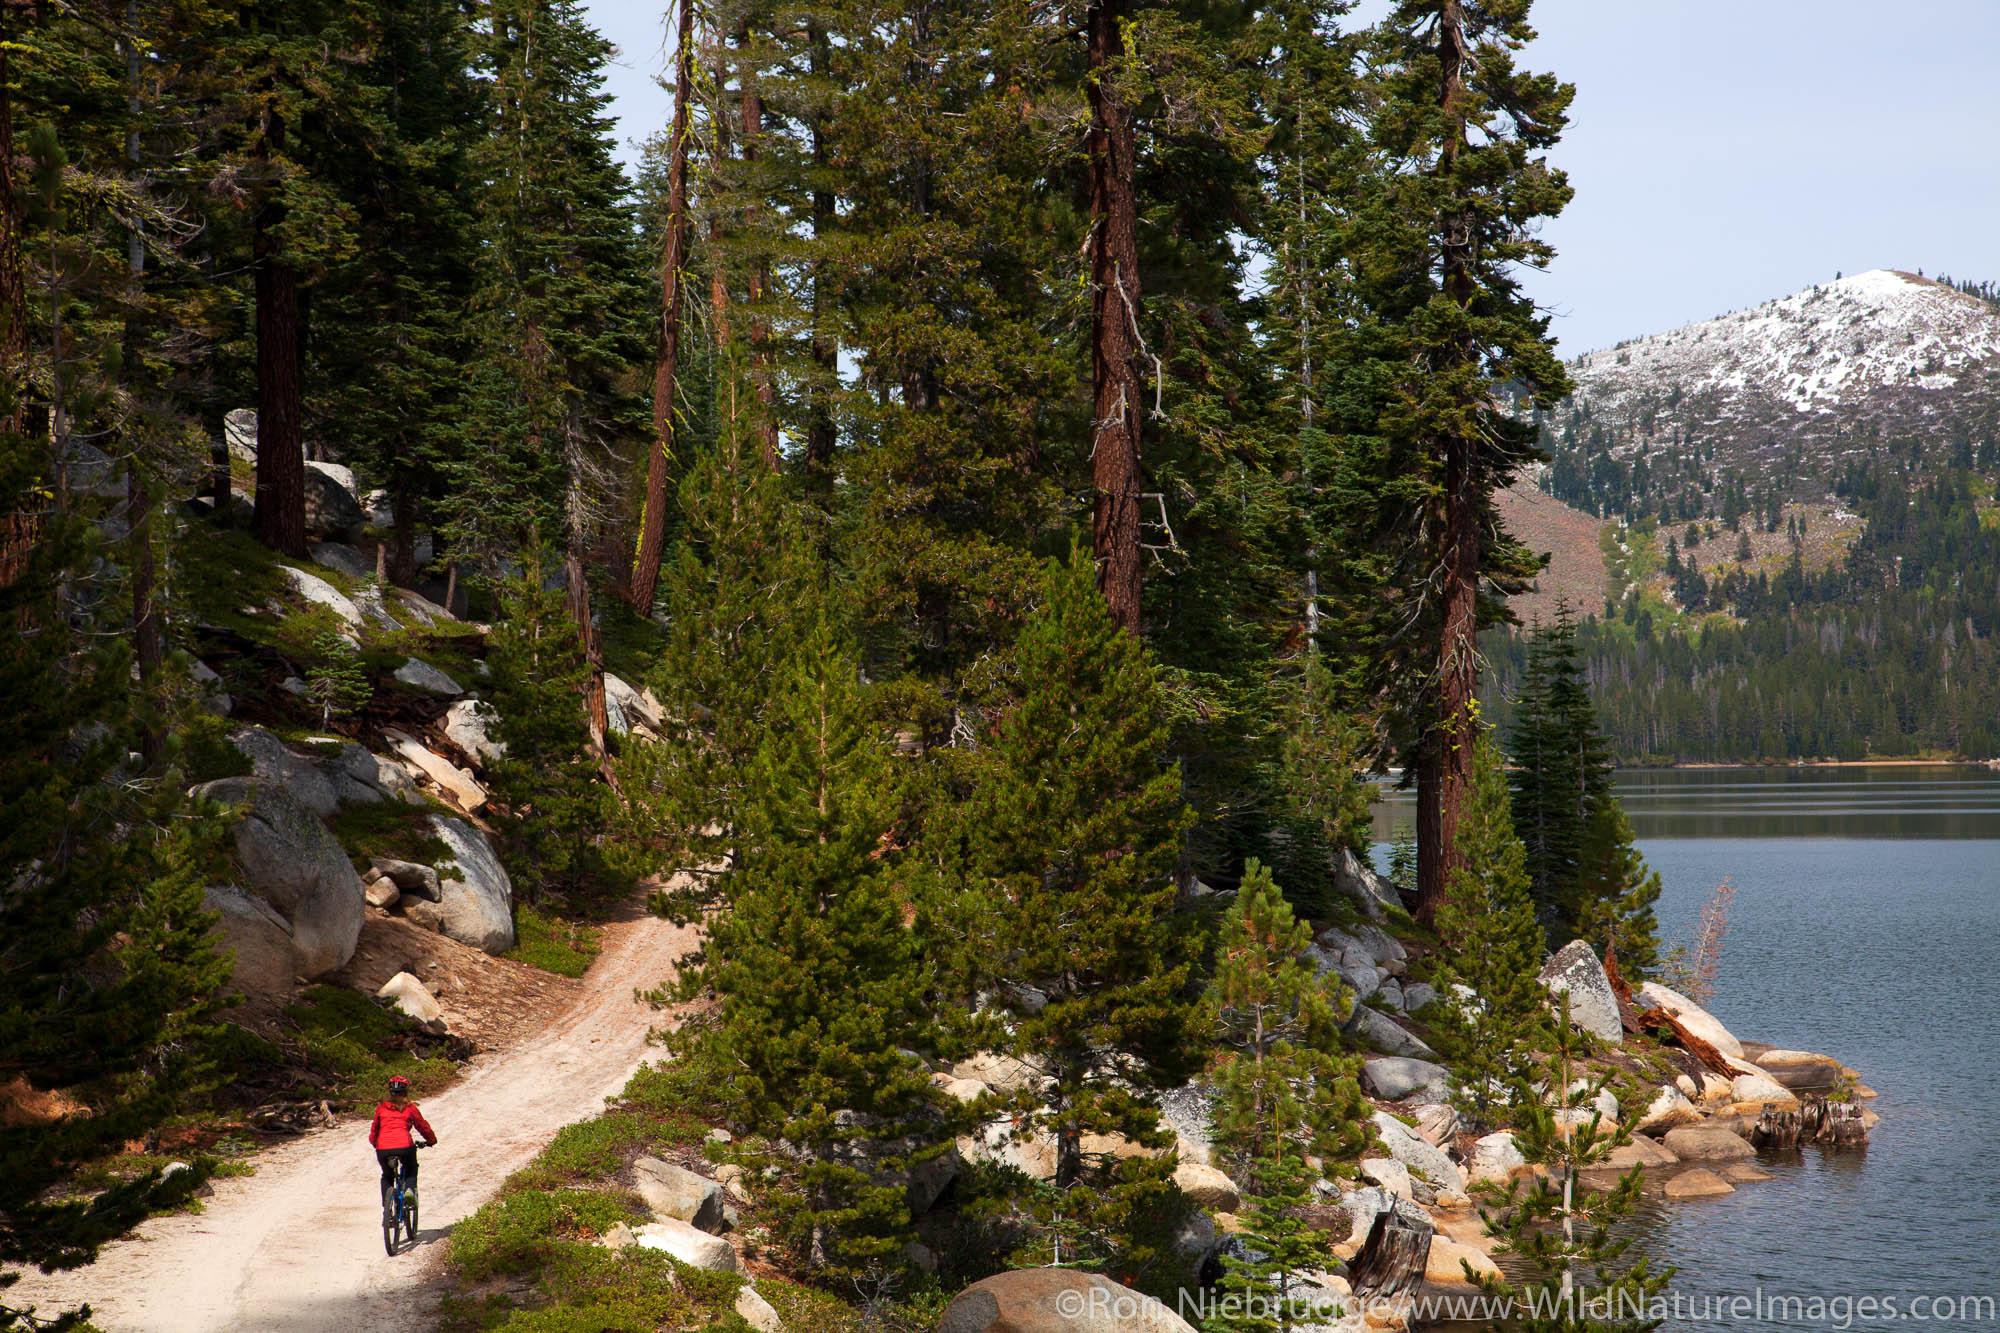 Mountain biking on the Flume Trail along Marlette Lake, Lake Tahoe, NV (model released)